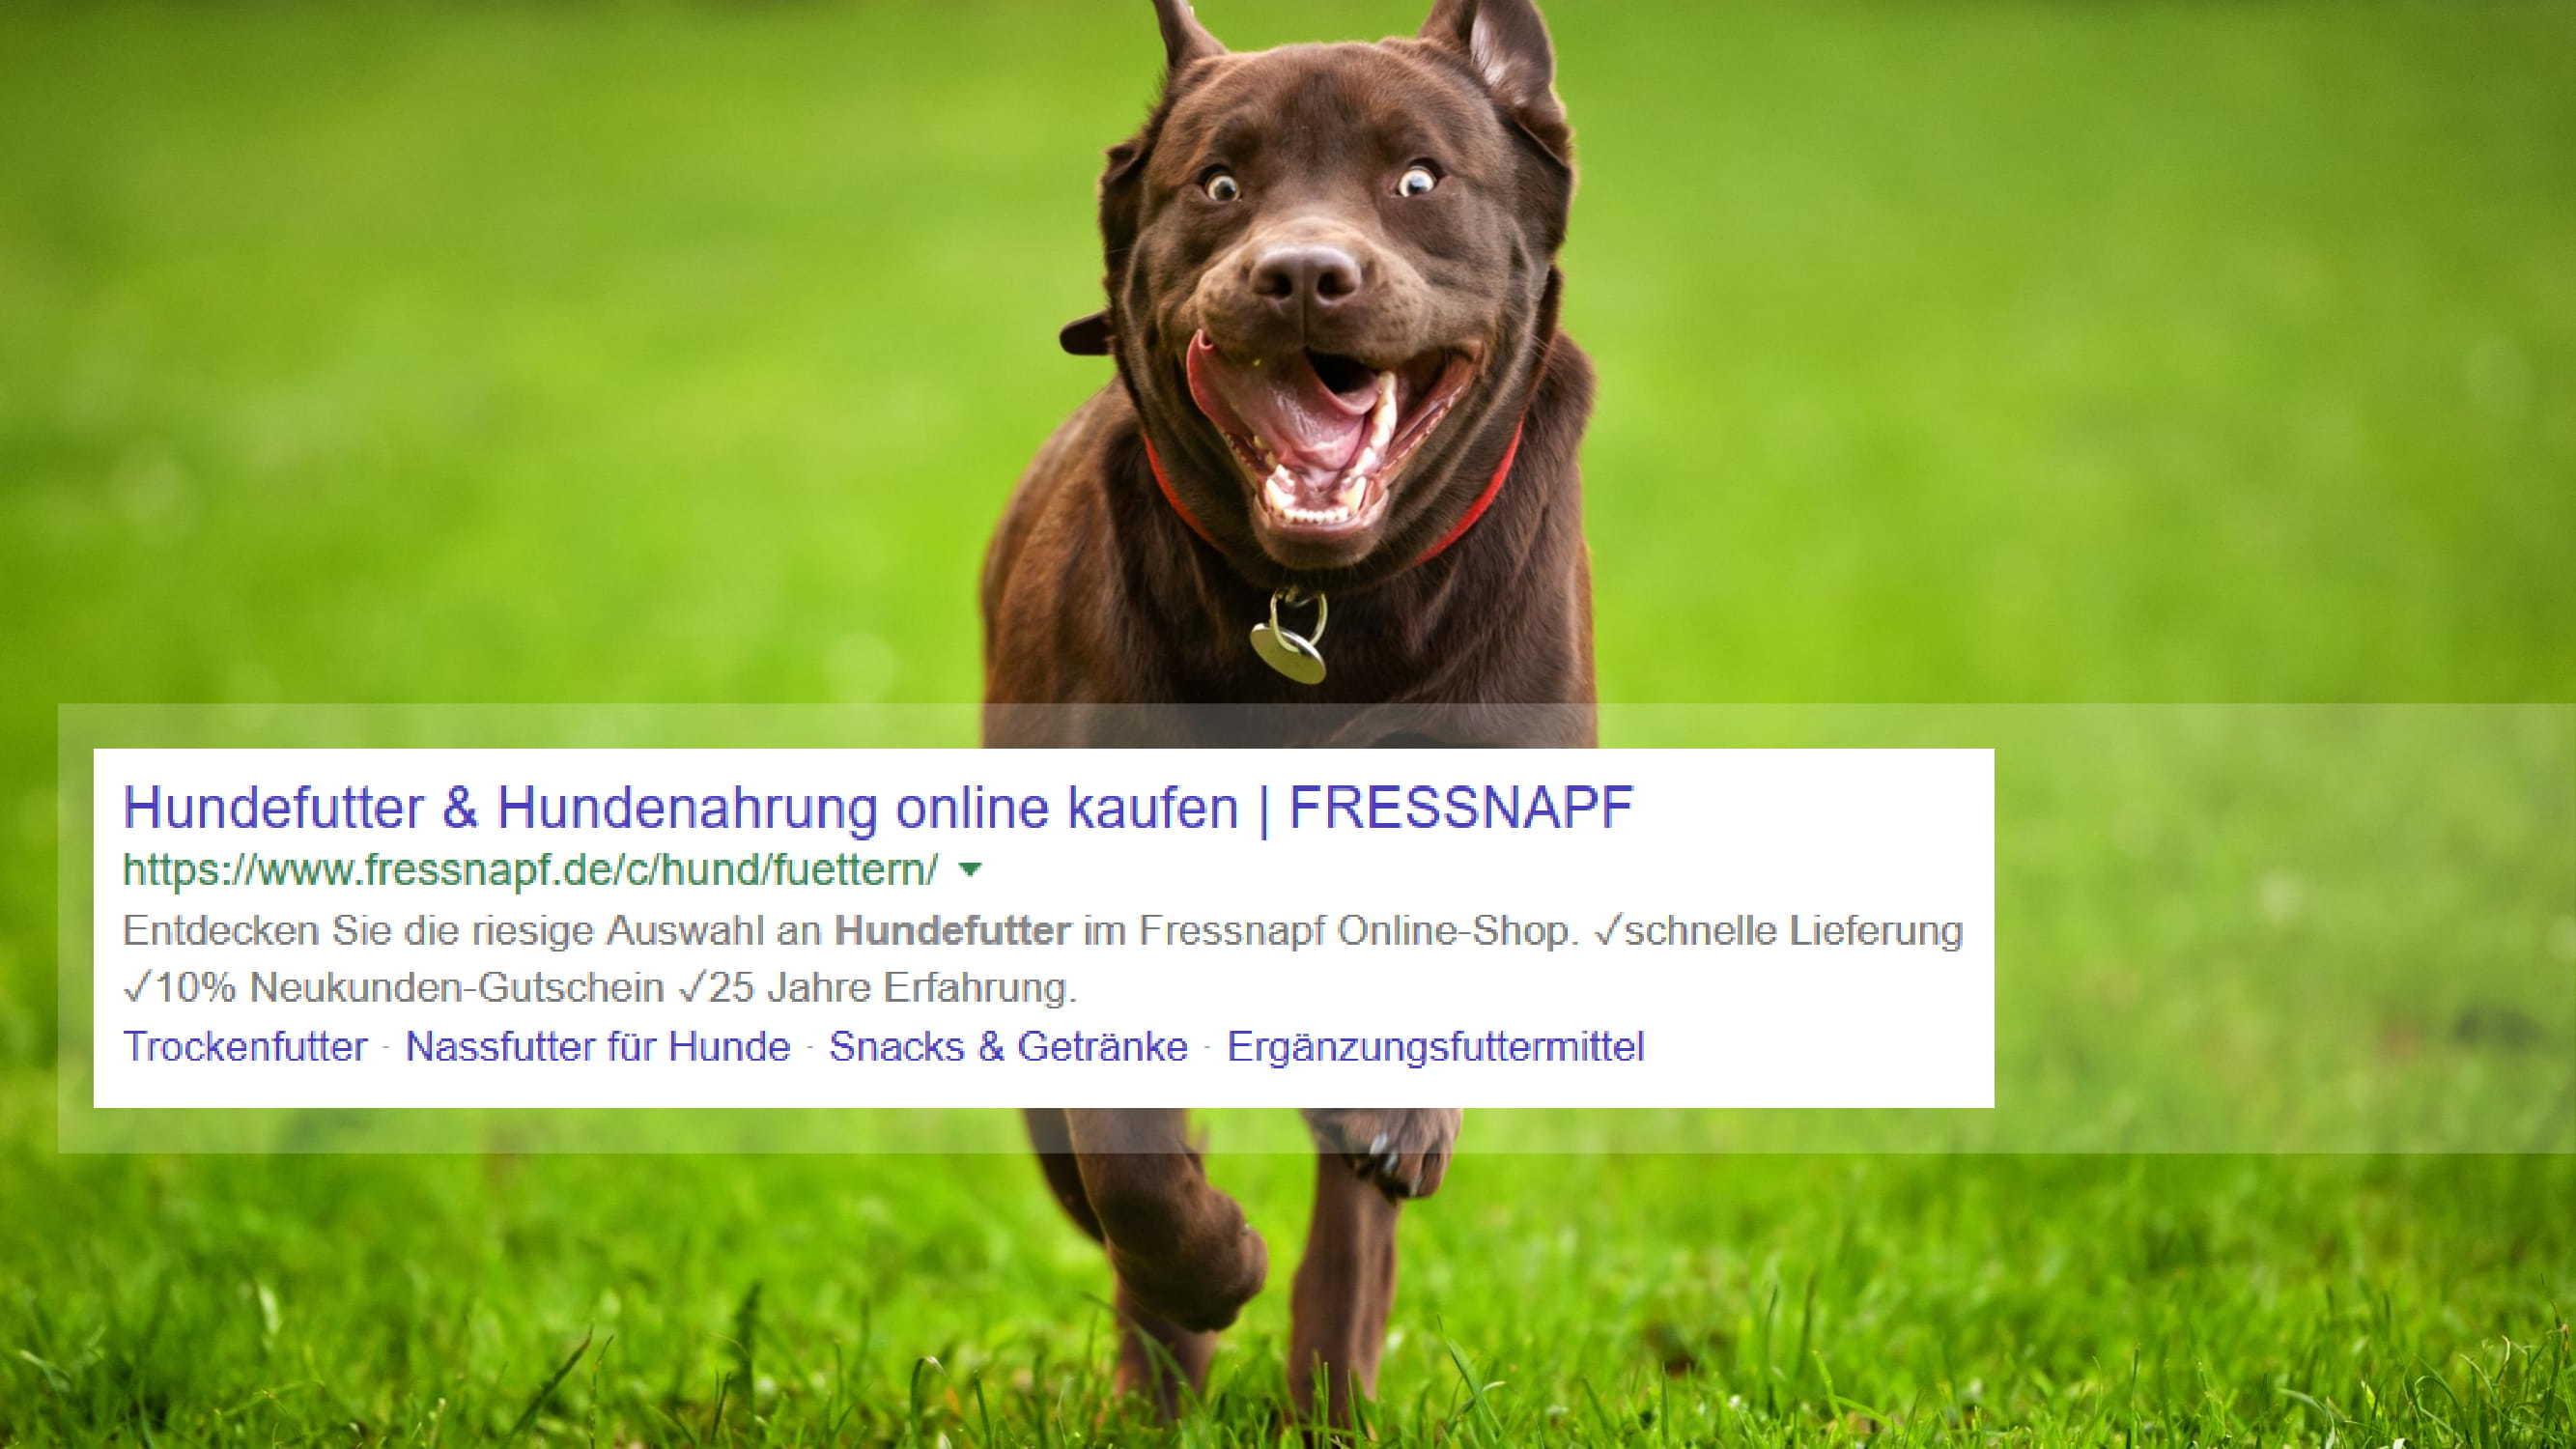 7-wirkungsvolle-online-marketing-hebel-fur-online-shops-20.jpg